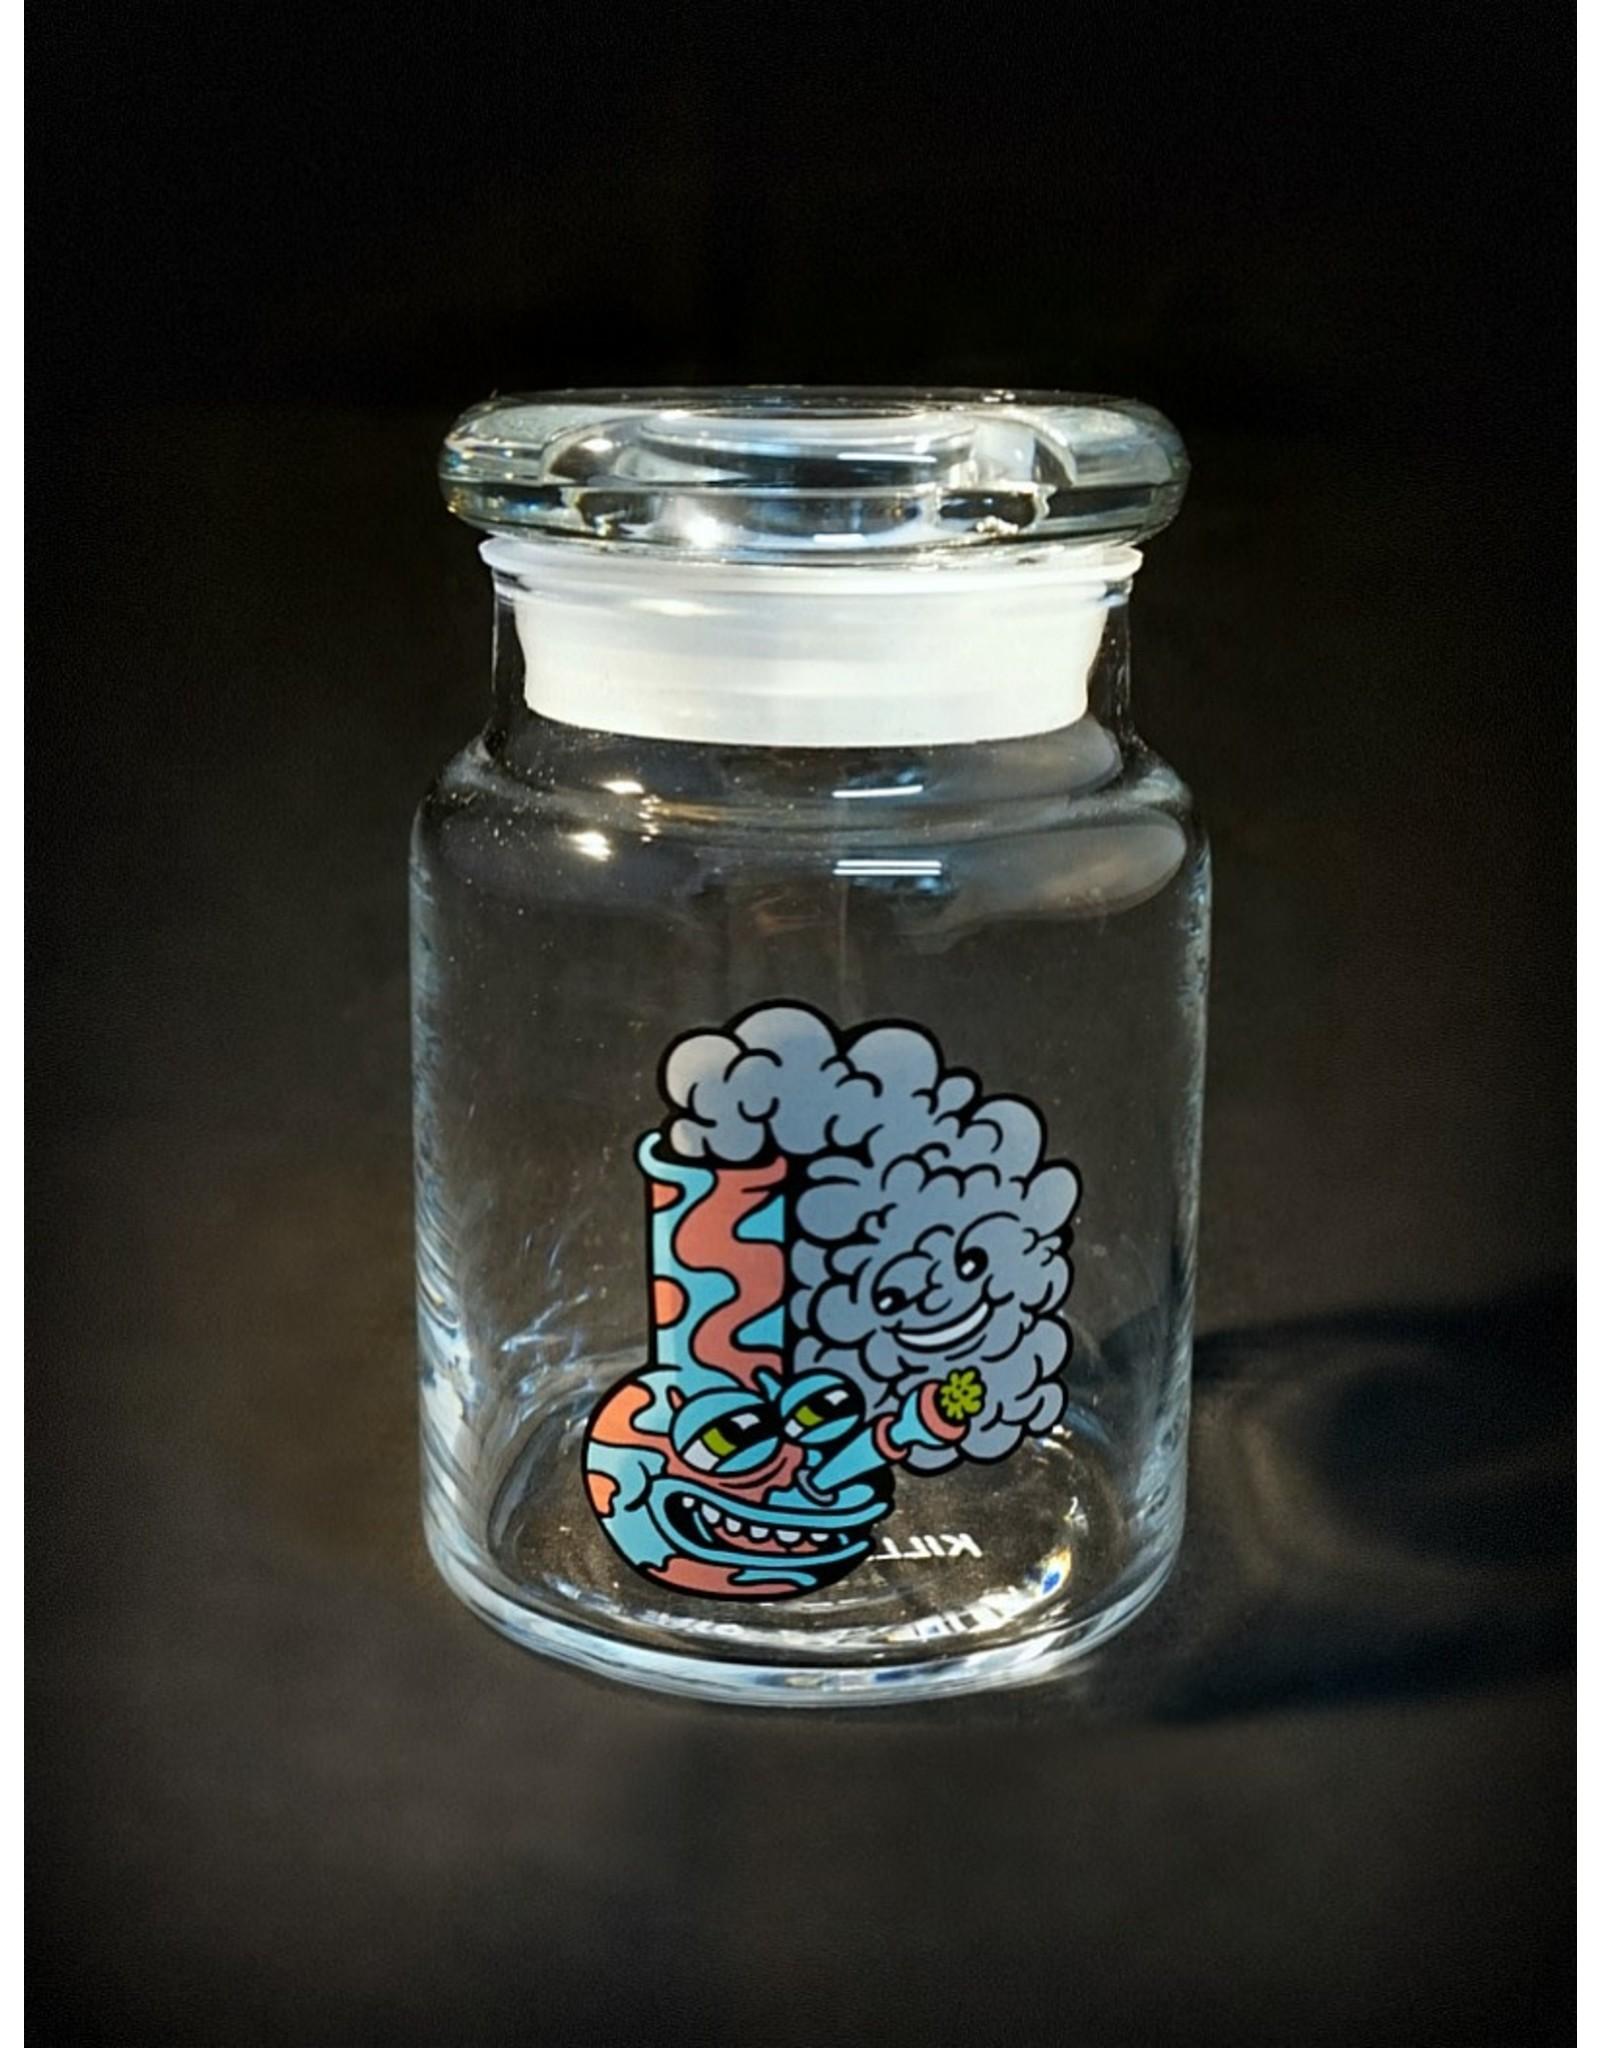 420 Science 420 Science Jars Small Happy Bong Pop Top